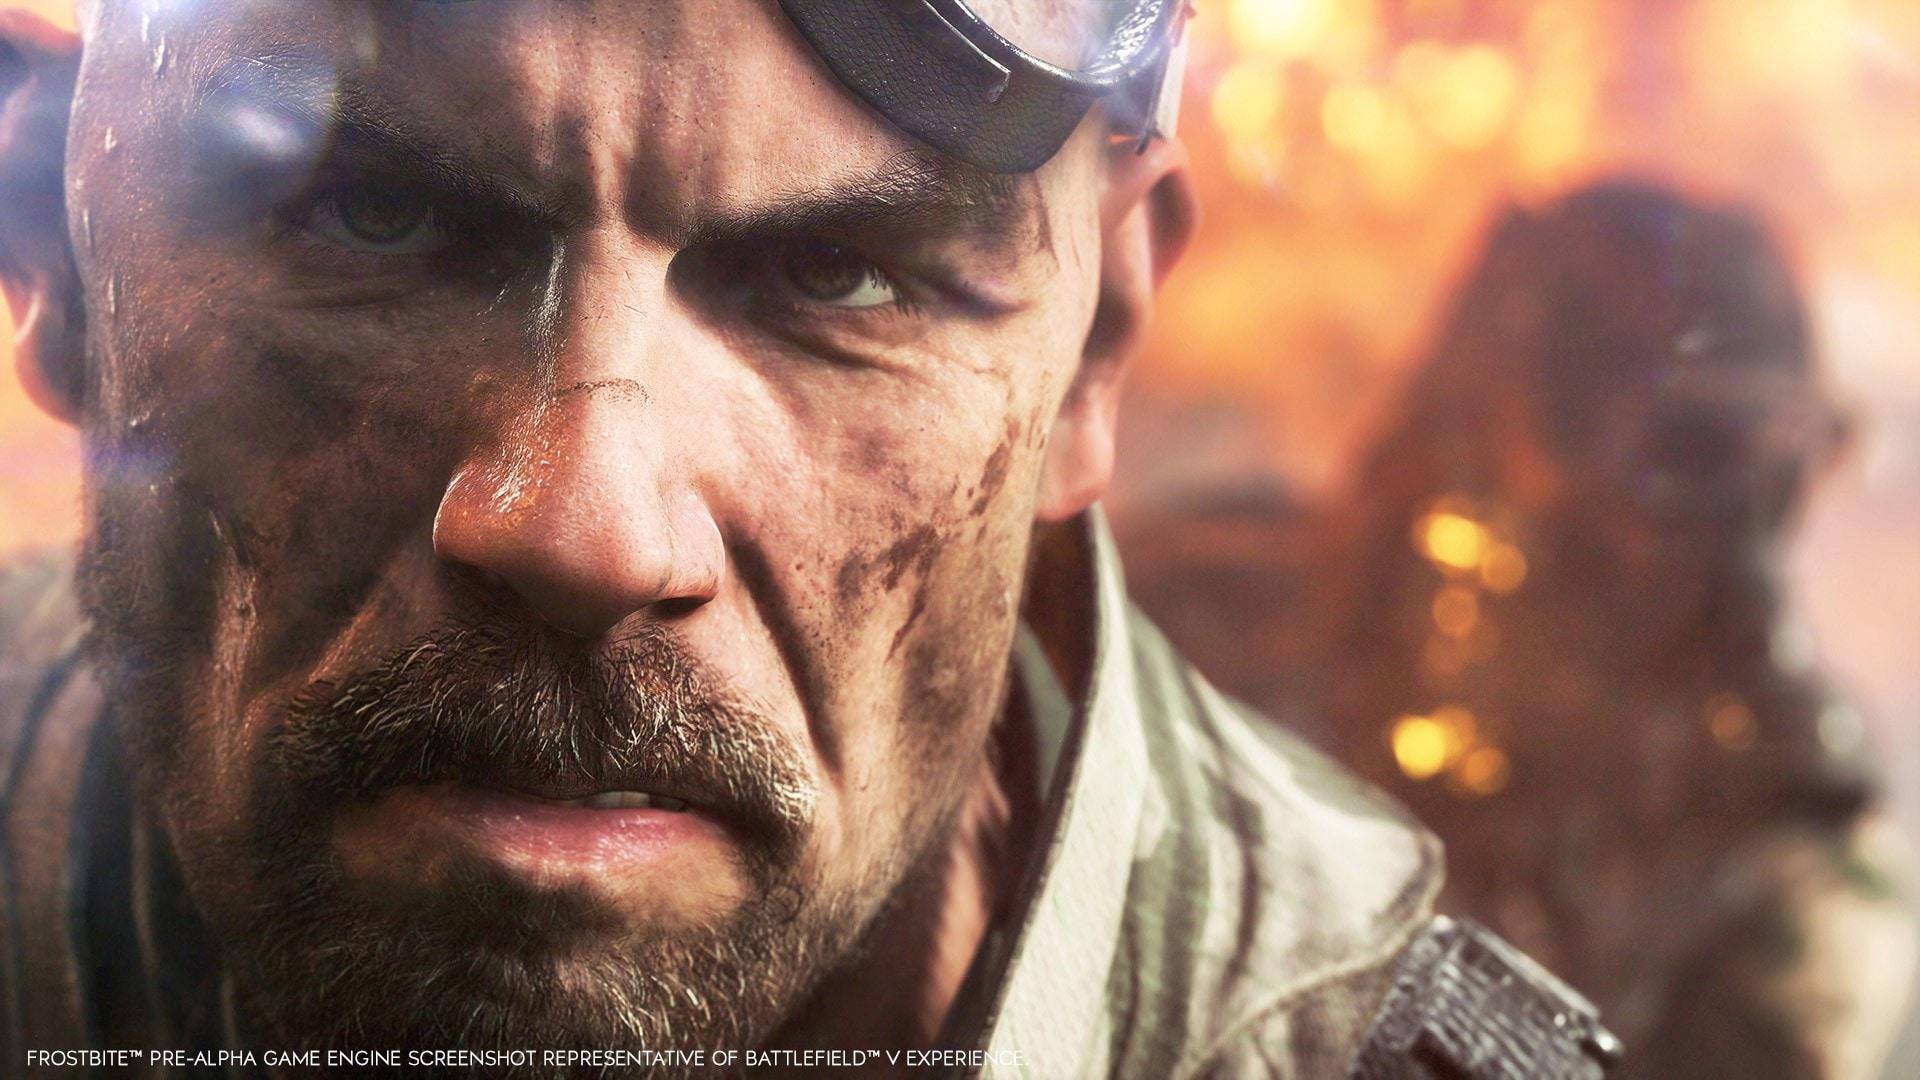 Battlefield V | Definitive Edition (PC) - Origin Key - GLOBAL (English Only) - 4